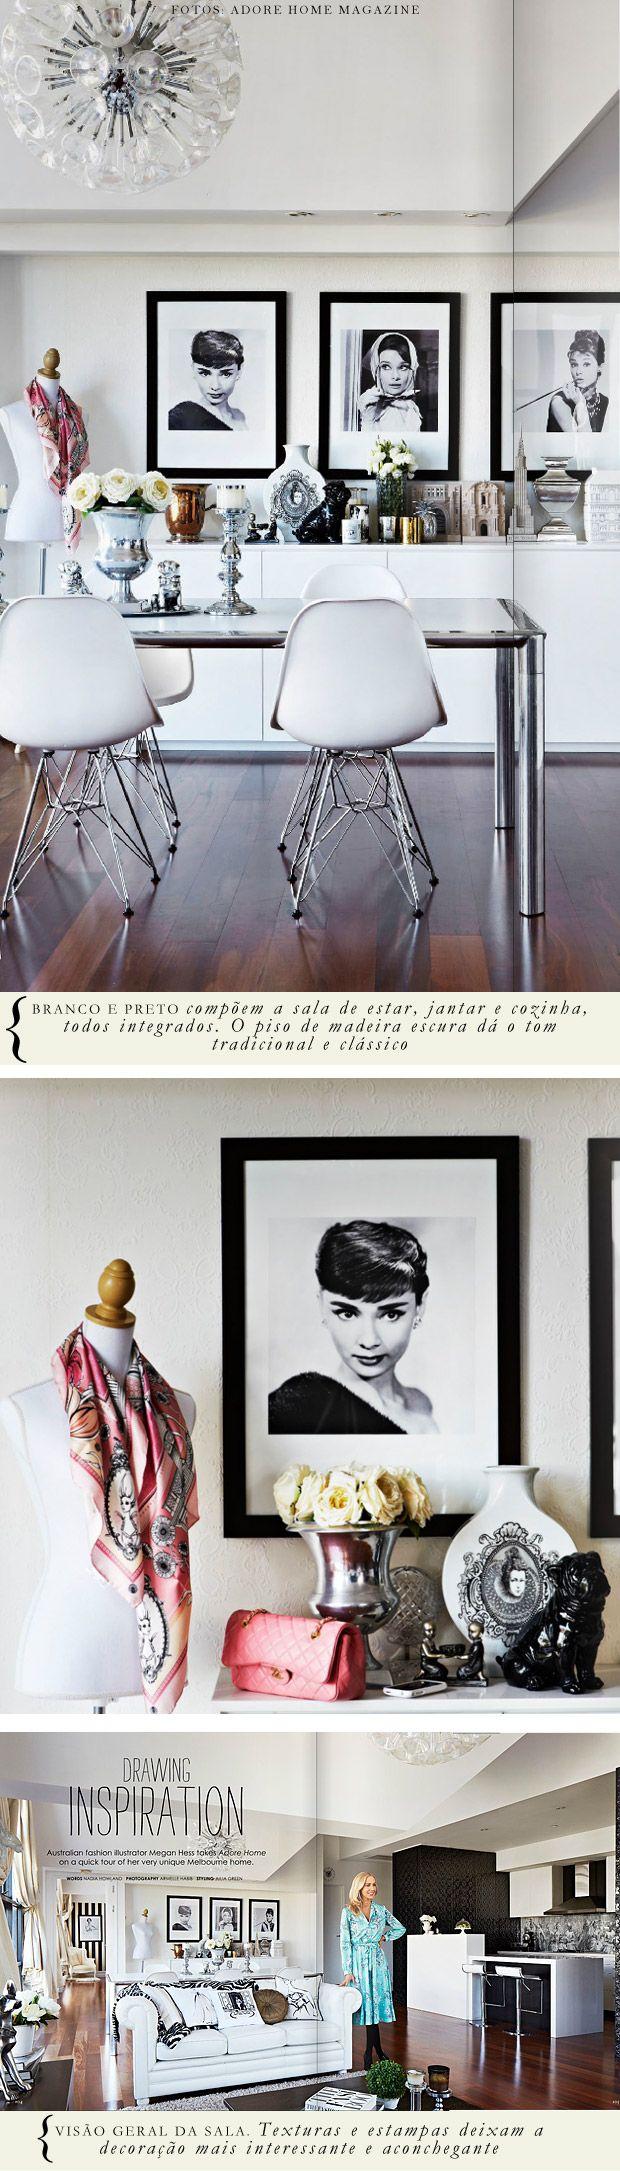 living-gazette-barbara-resende-decor-tour-megan-hess-illustrator-home-living-room